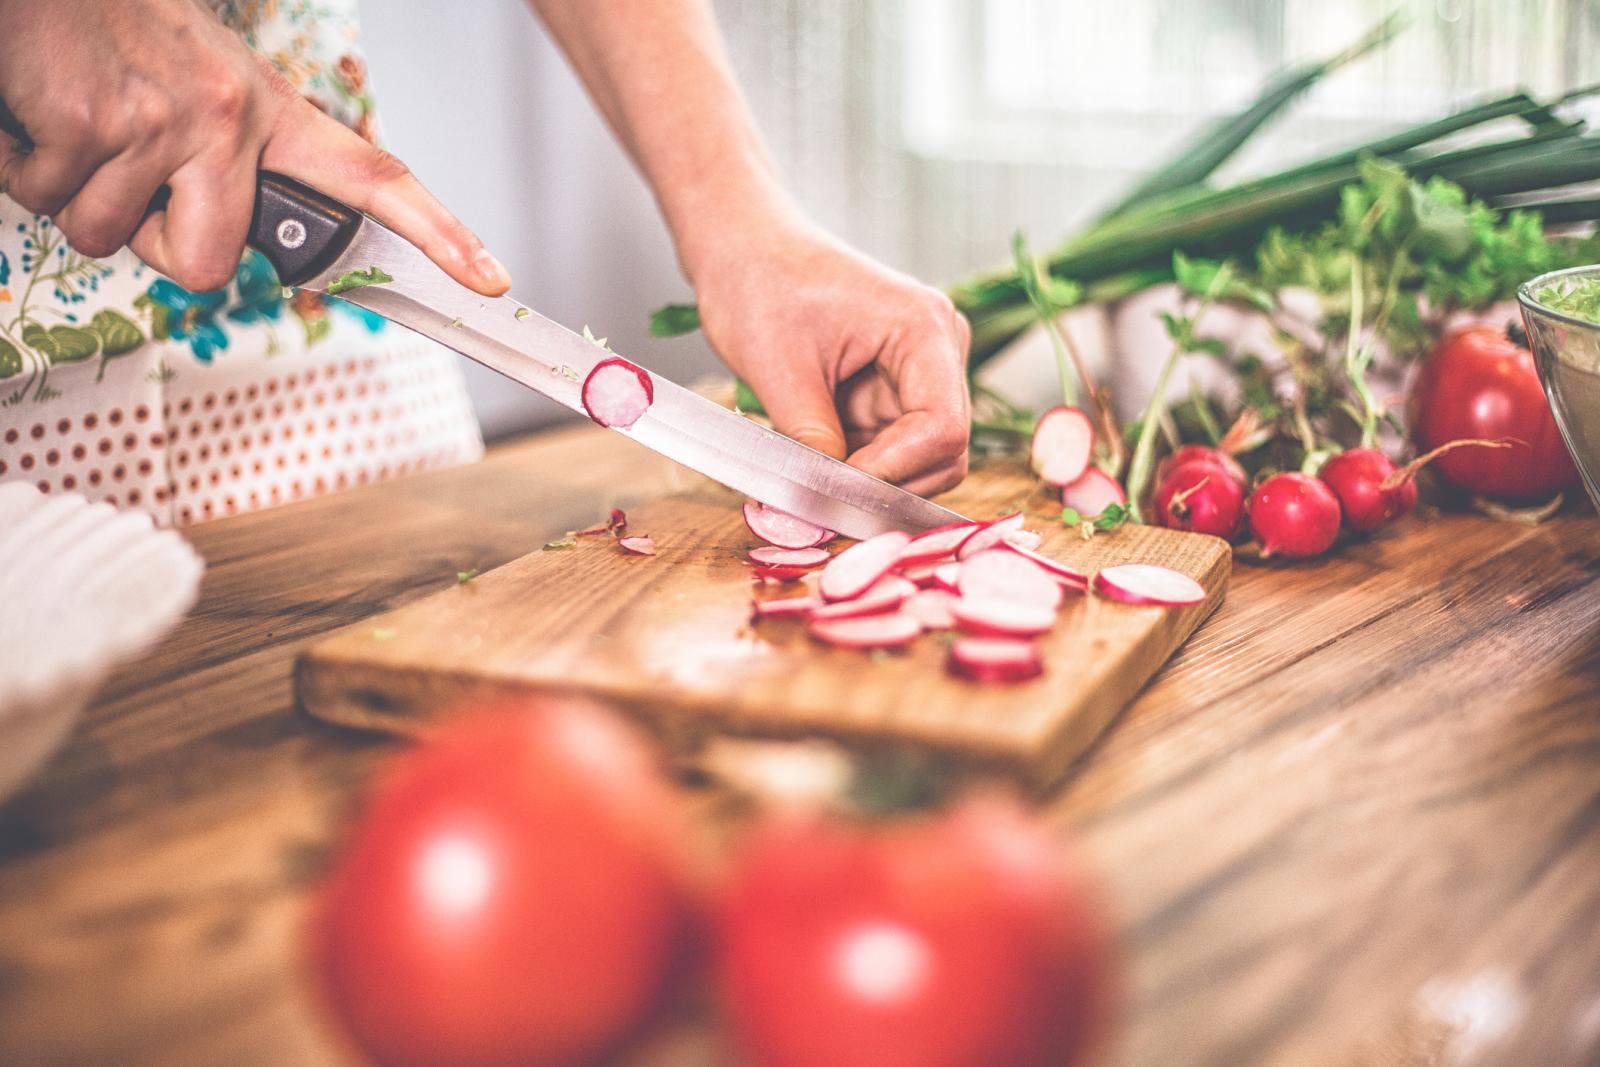 Rotkvice sadrže vlakna, vitamin C i kalij.